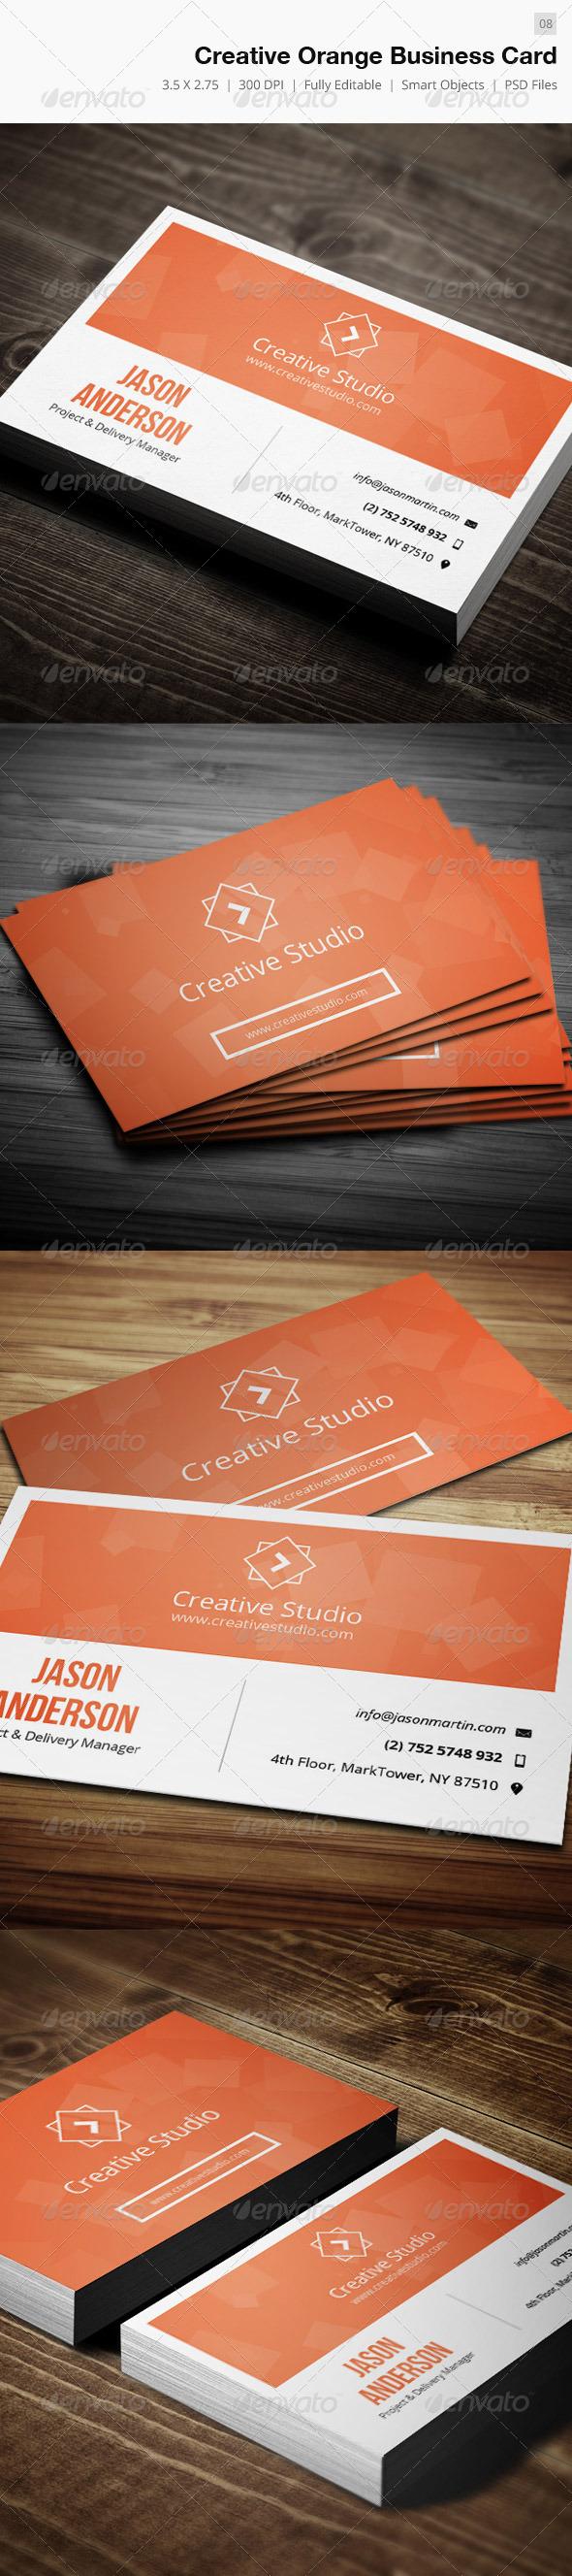 Creative Corporate Business Card - 07 - Corporate Business Cards